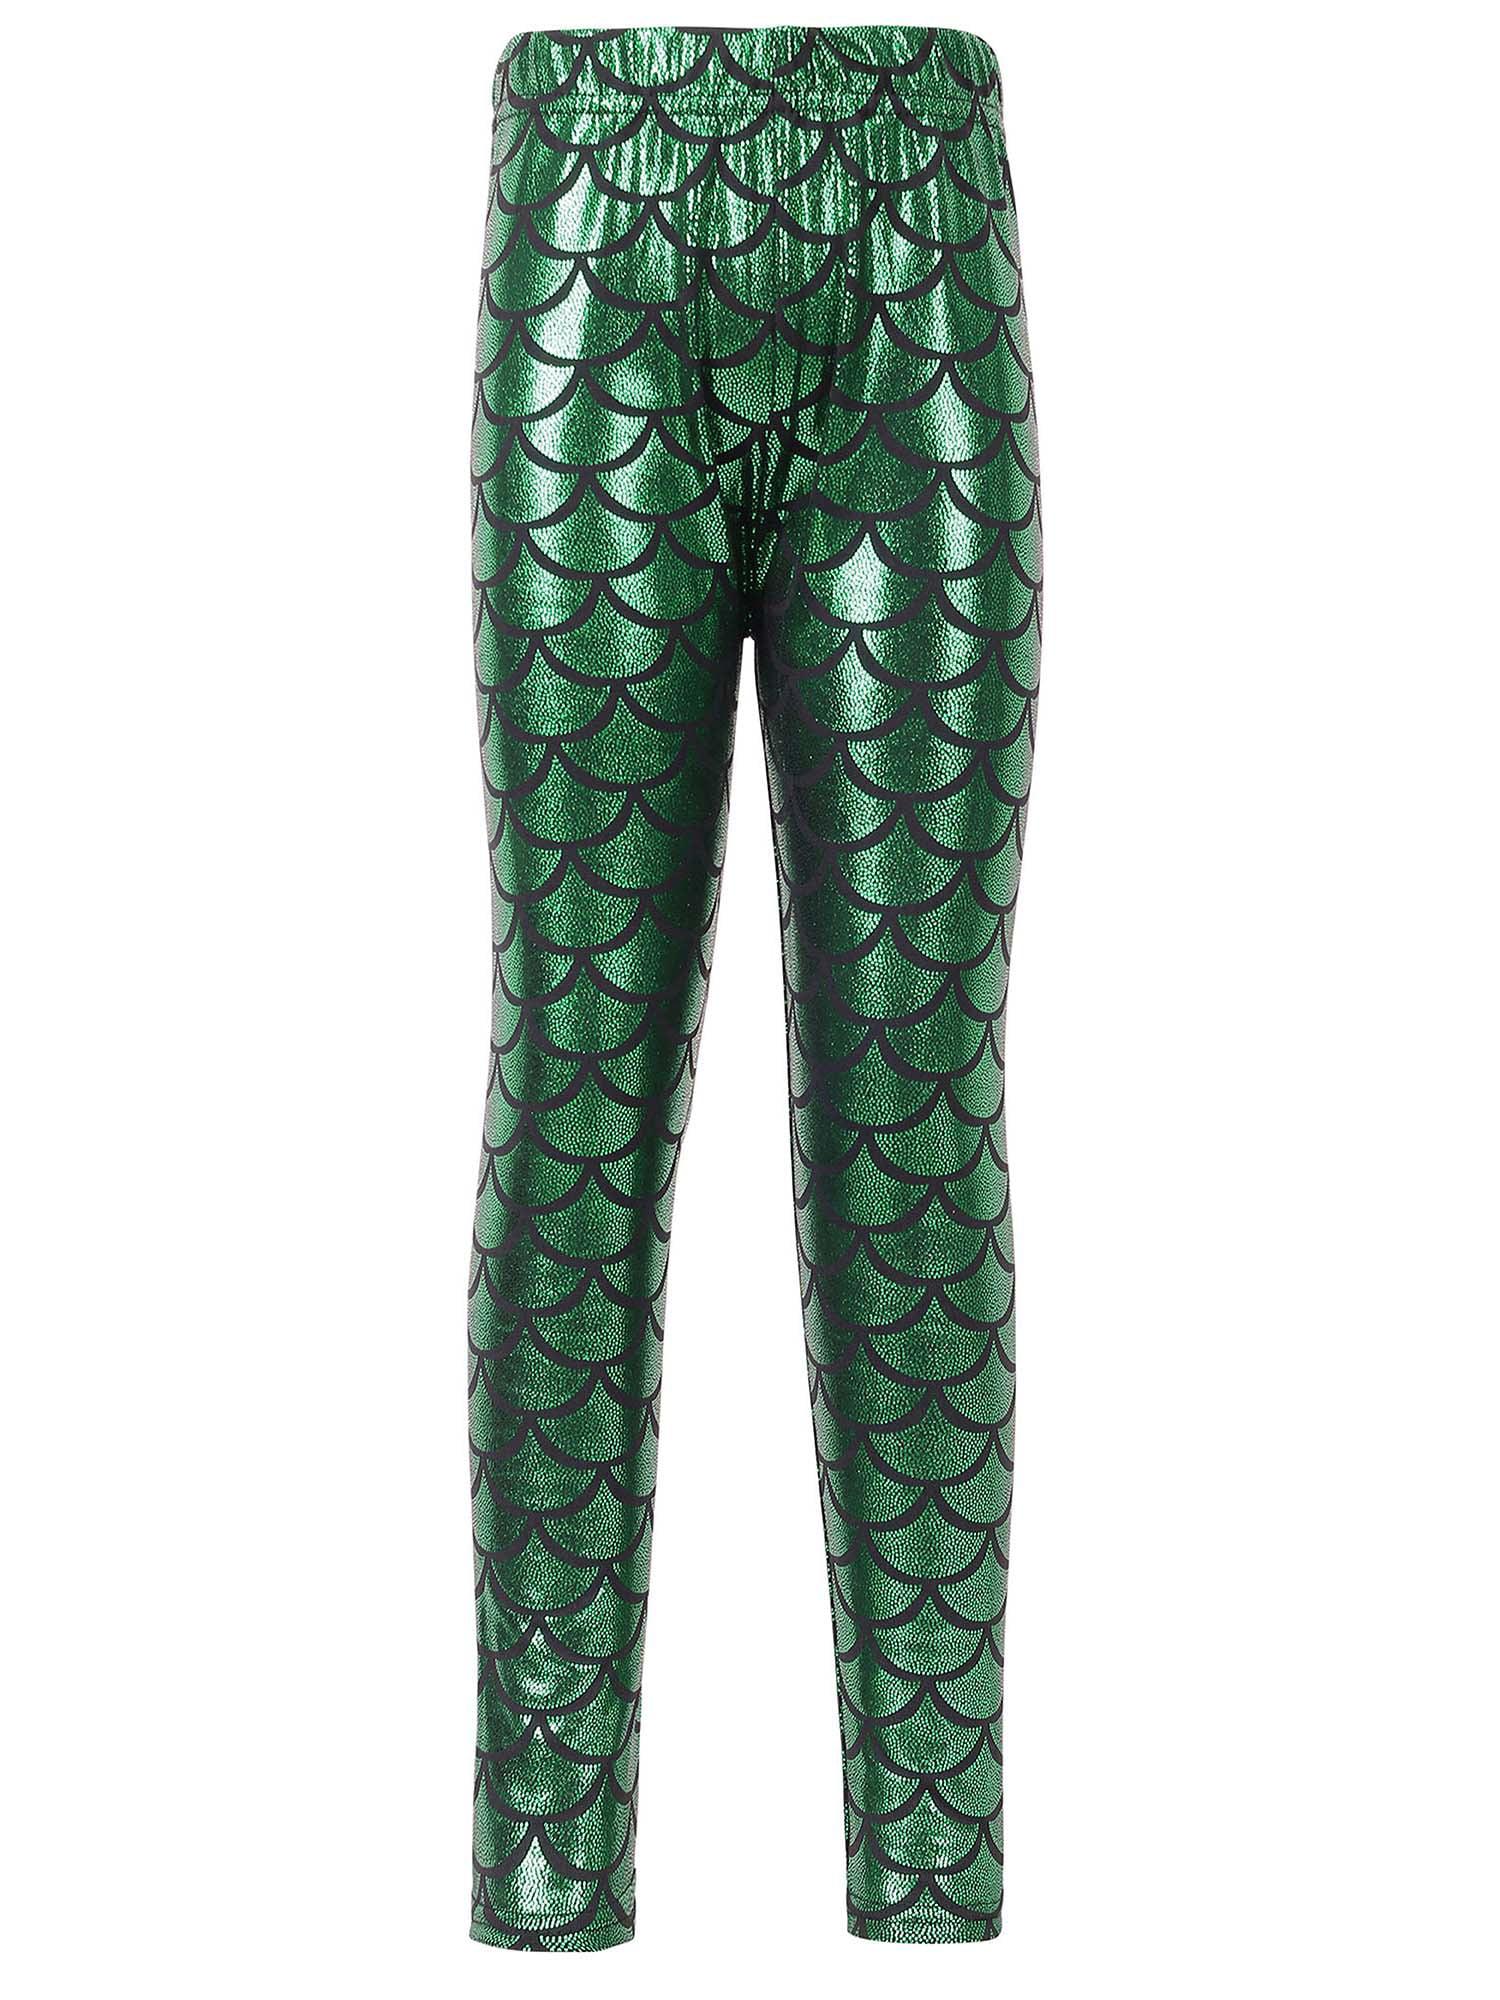 Girls Mermaid Scale Print Full Length Leggings Tight Pants, Blue, S